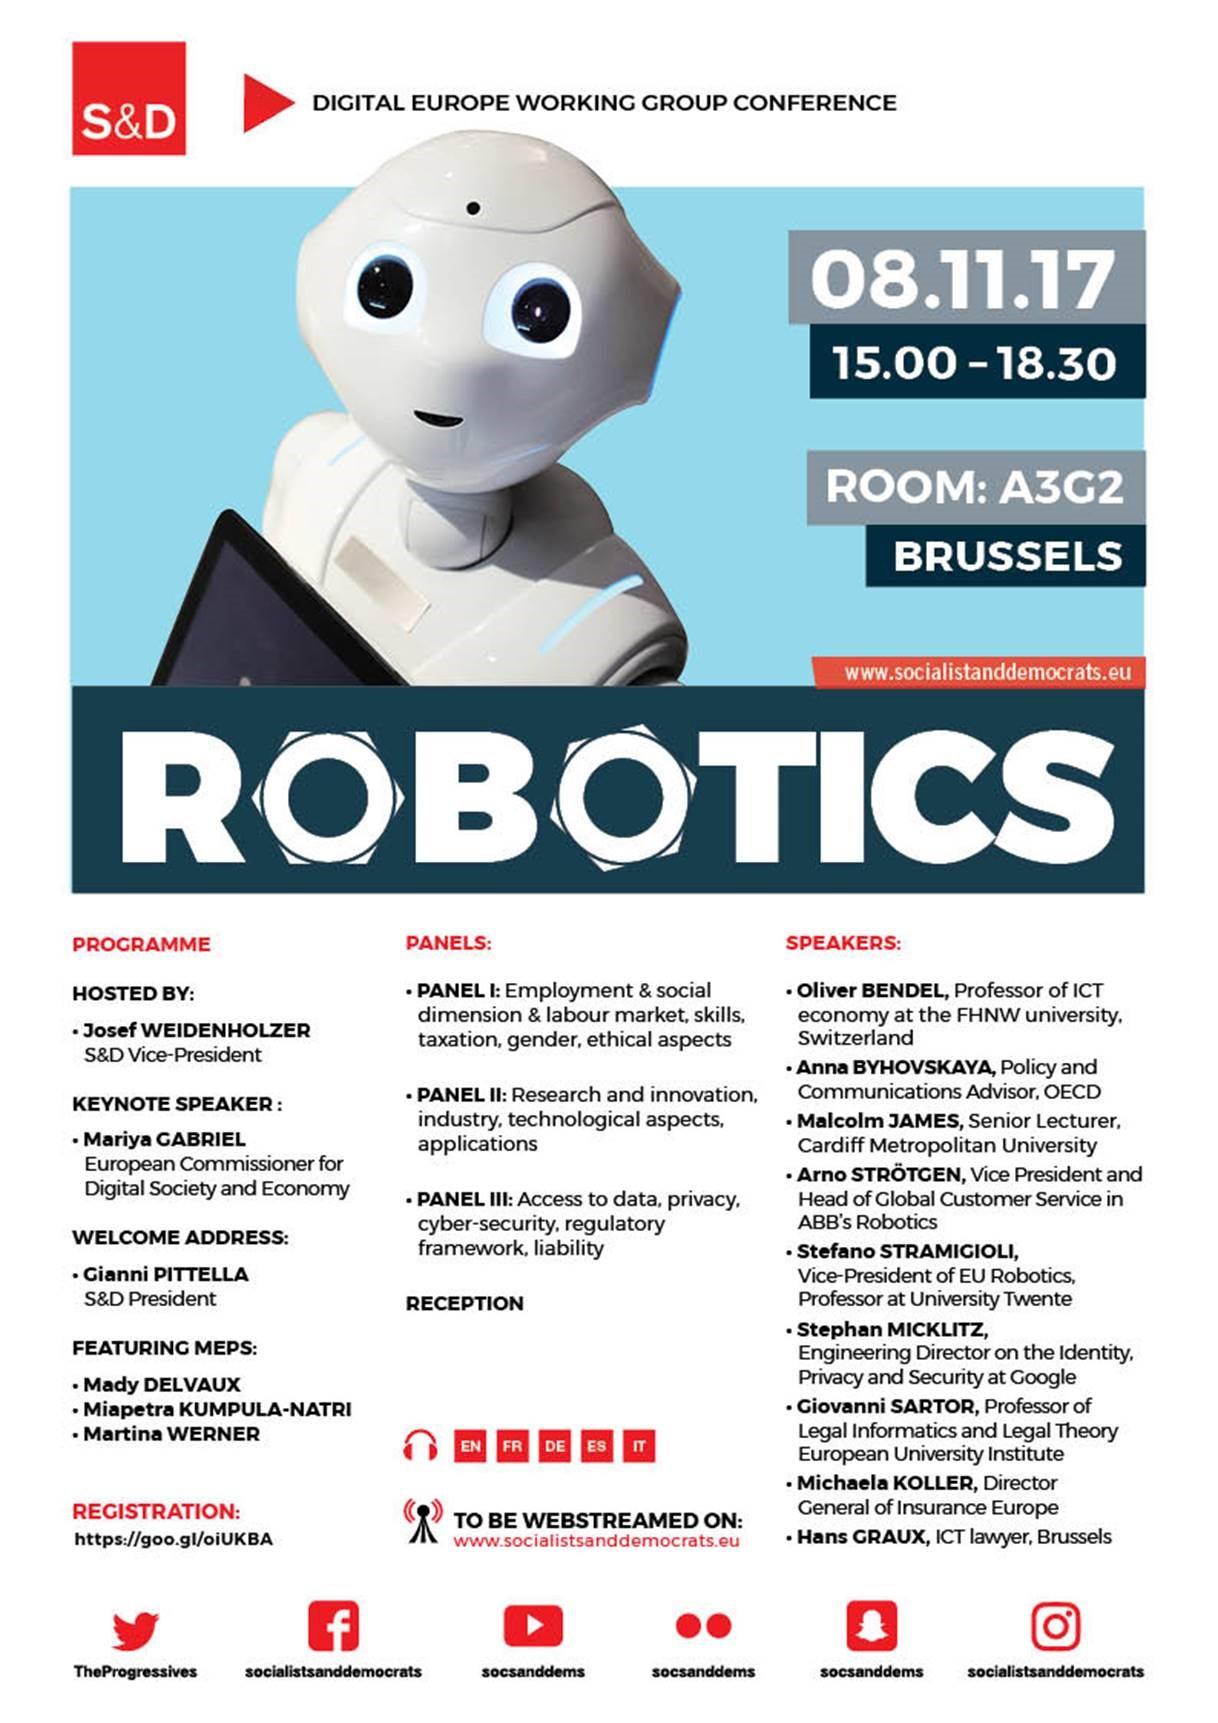 Robotics Conference at the European Parliament